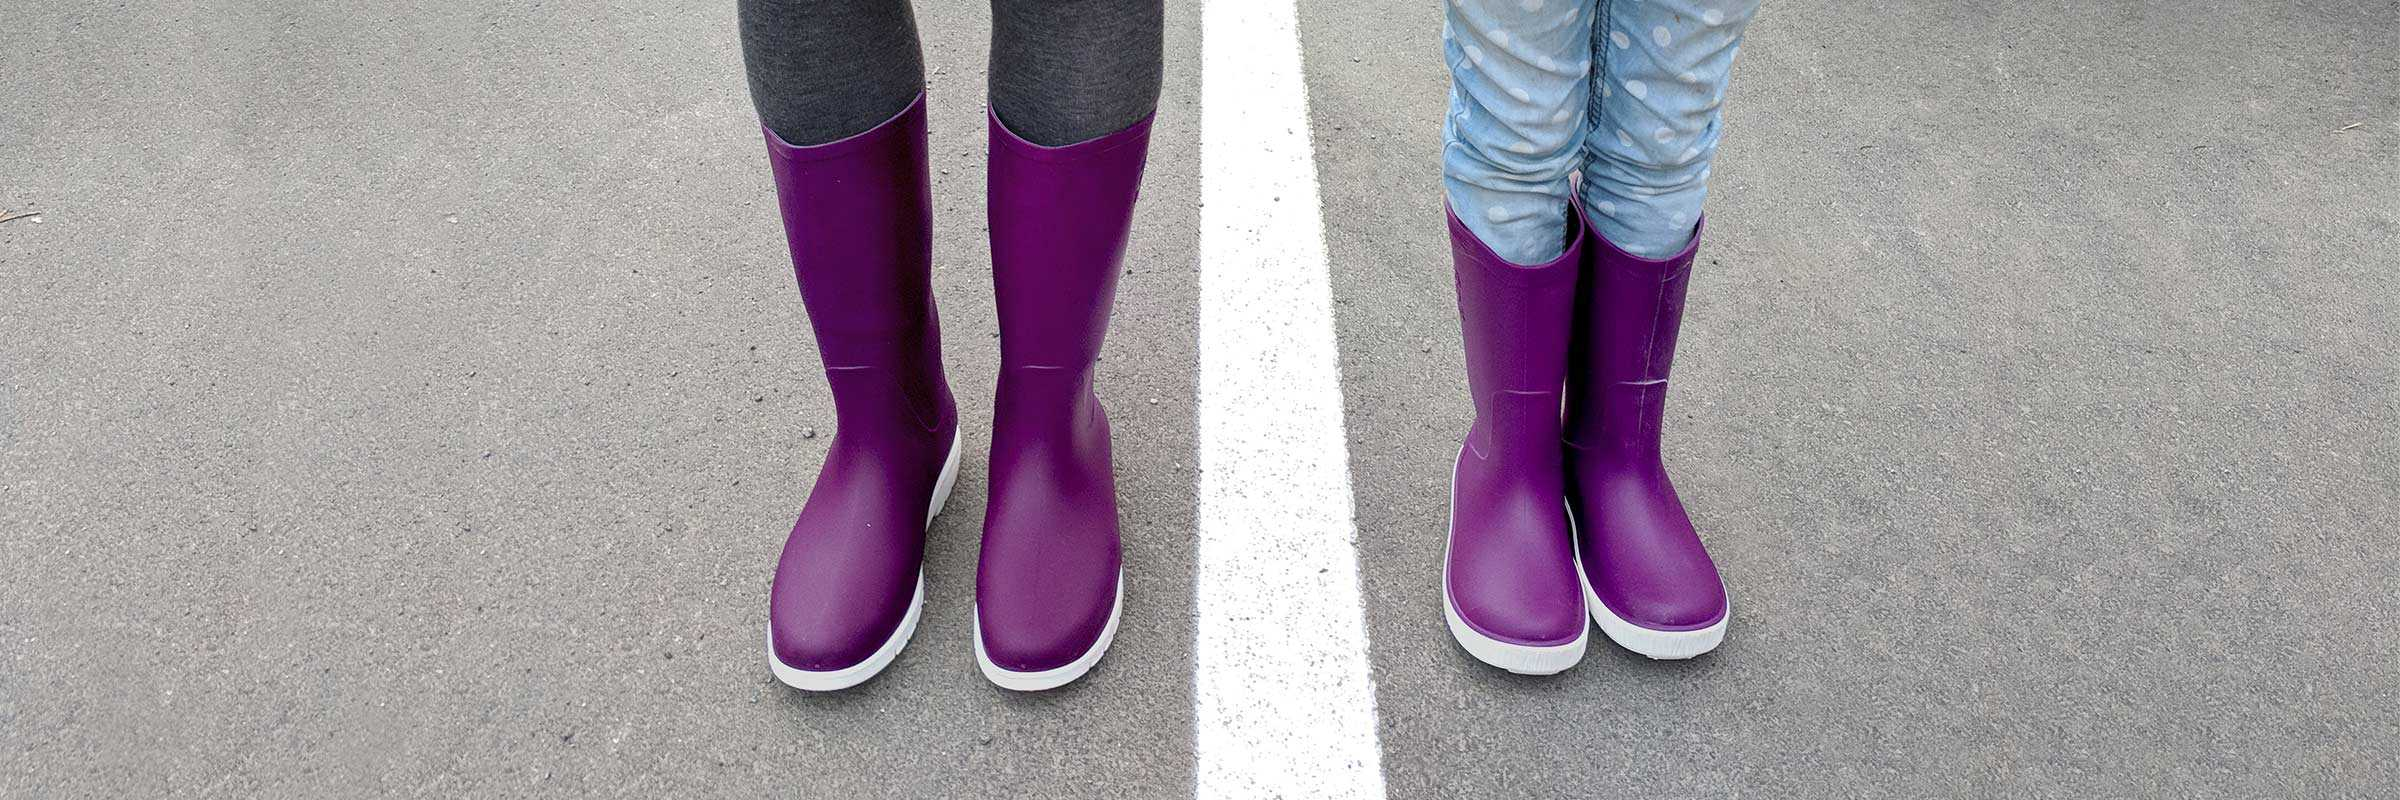 Kamik. Kamik Jessie and Riptides Boots Reviewed